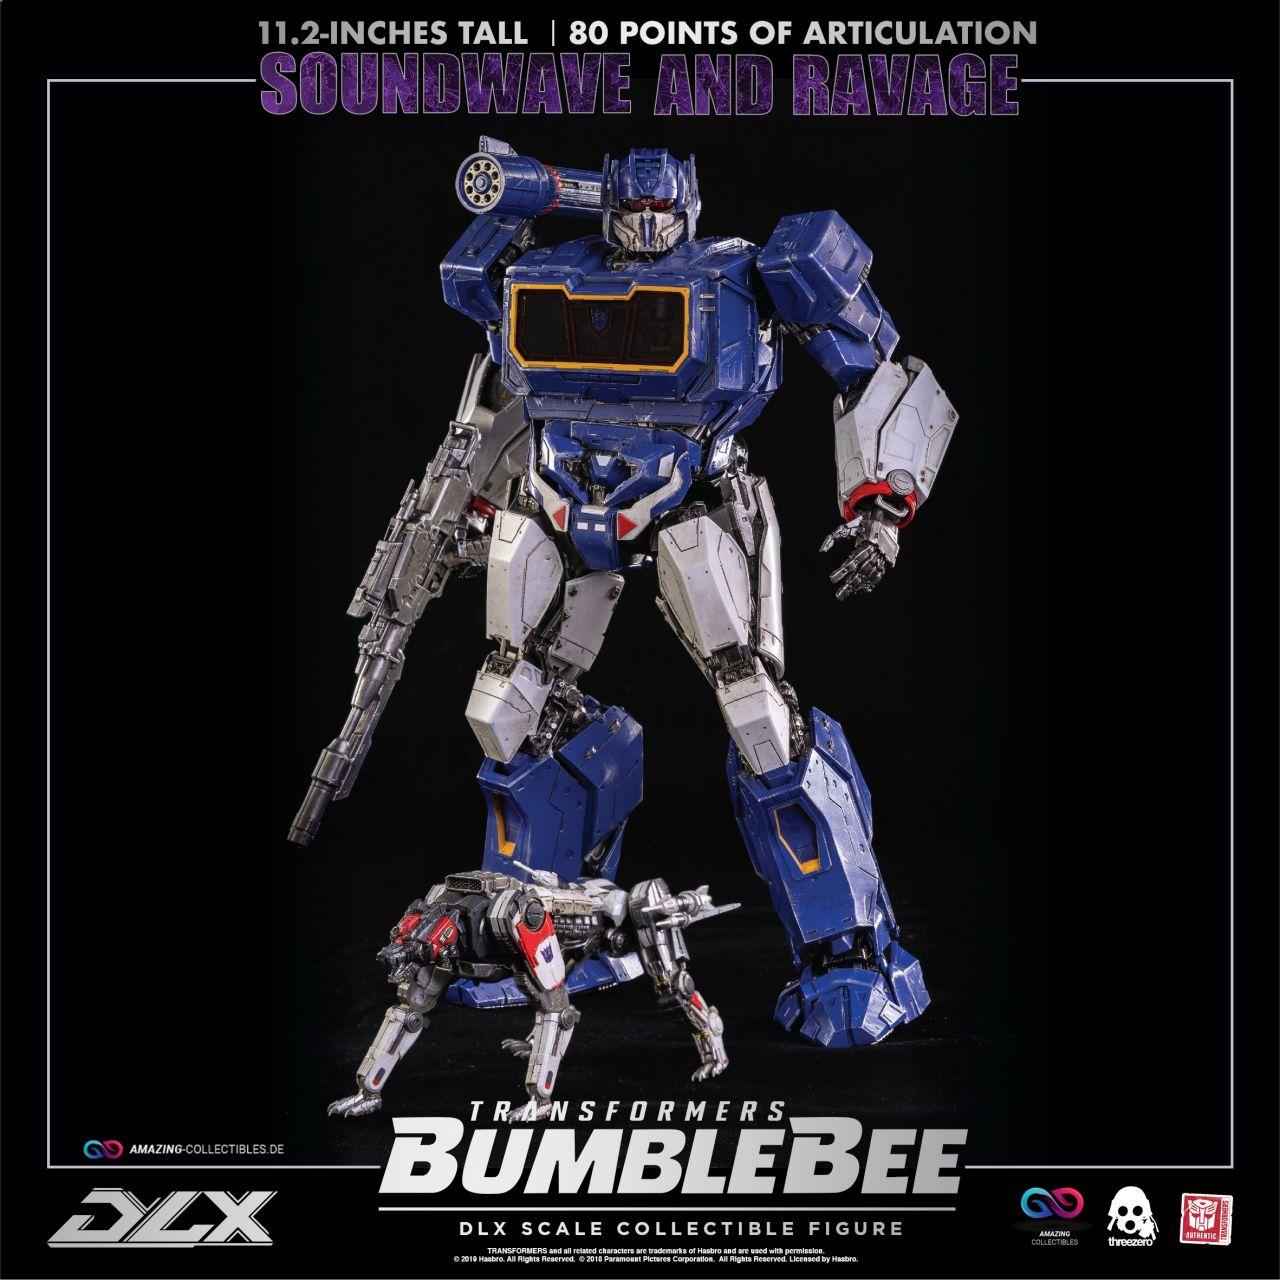 ThreeZero - Soundwave & Ravage - Transformers - Bumblebee - DLX Scale